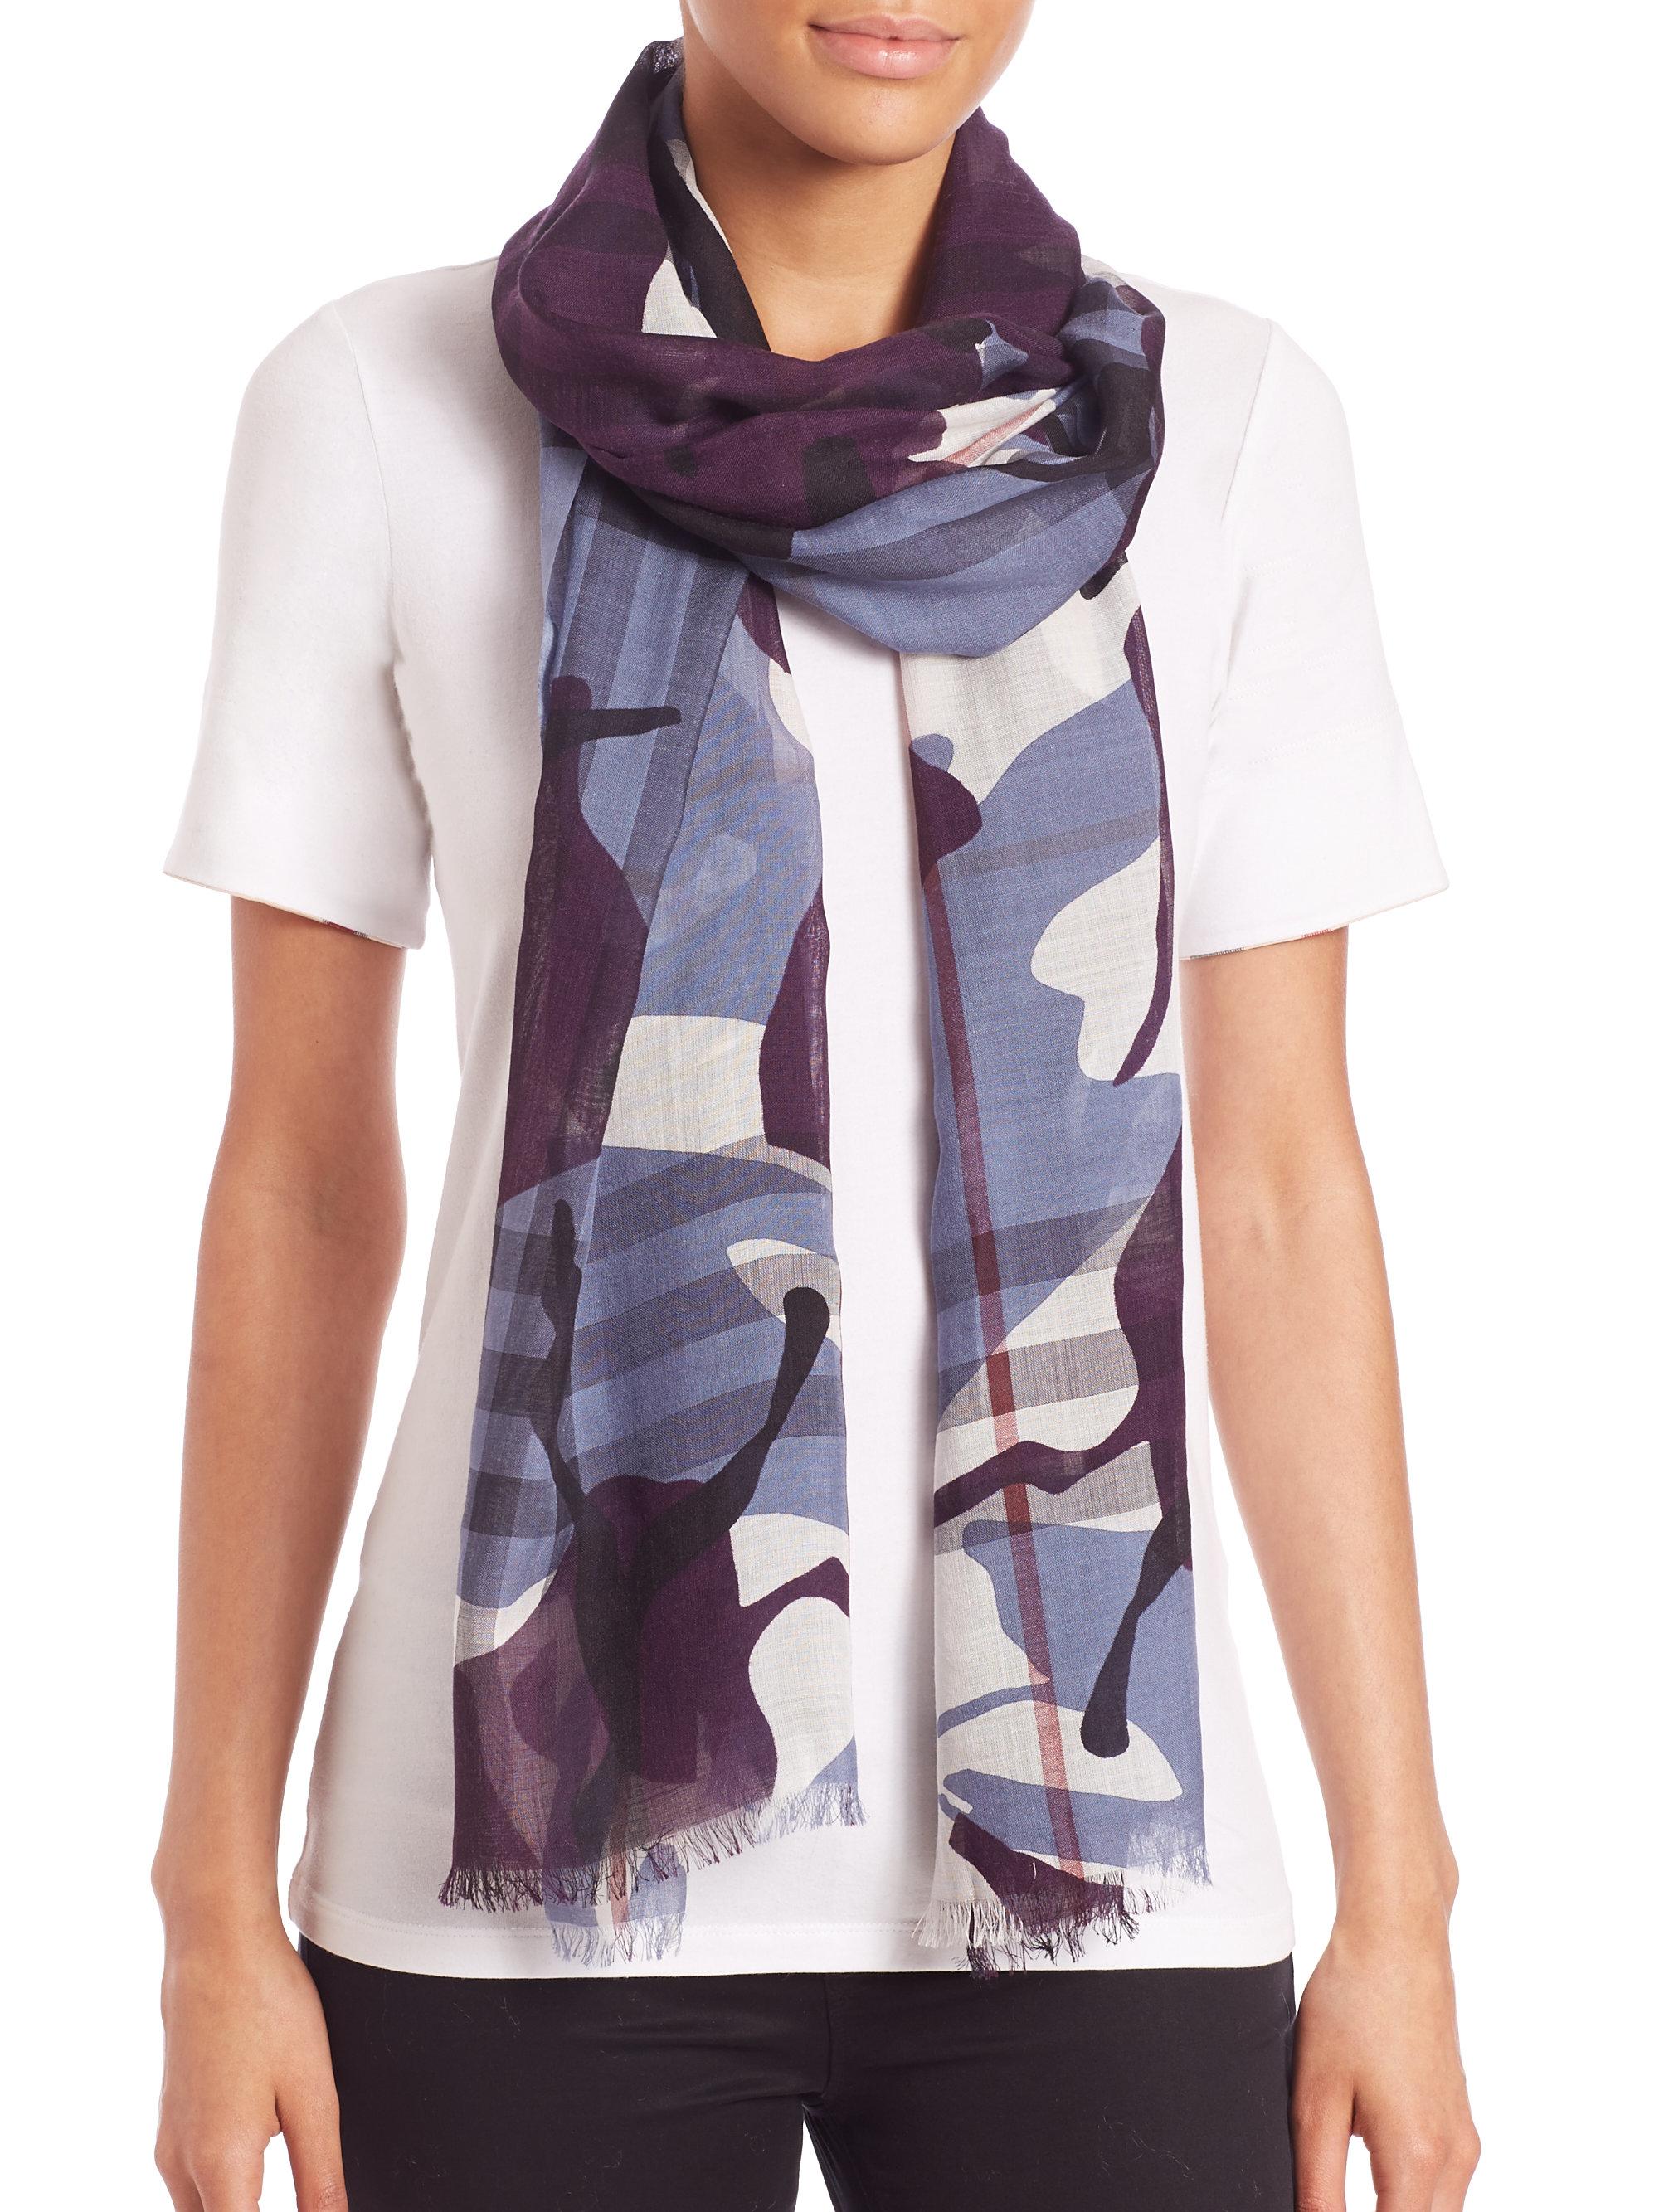 normal modal kenzo lyst ferrari franco accessories blue scarf in gallery eyes product silk